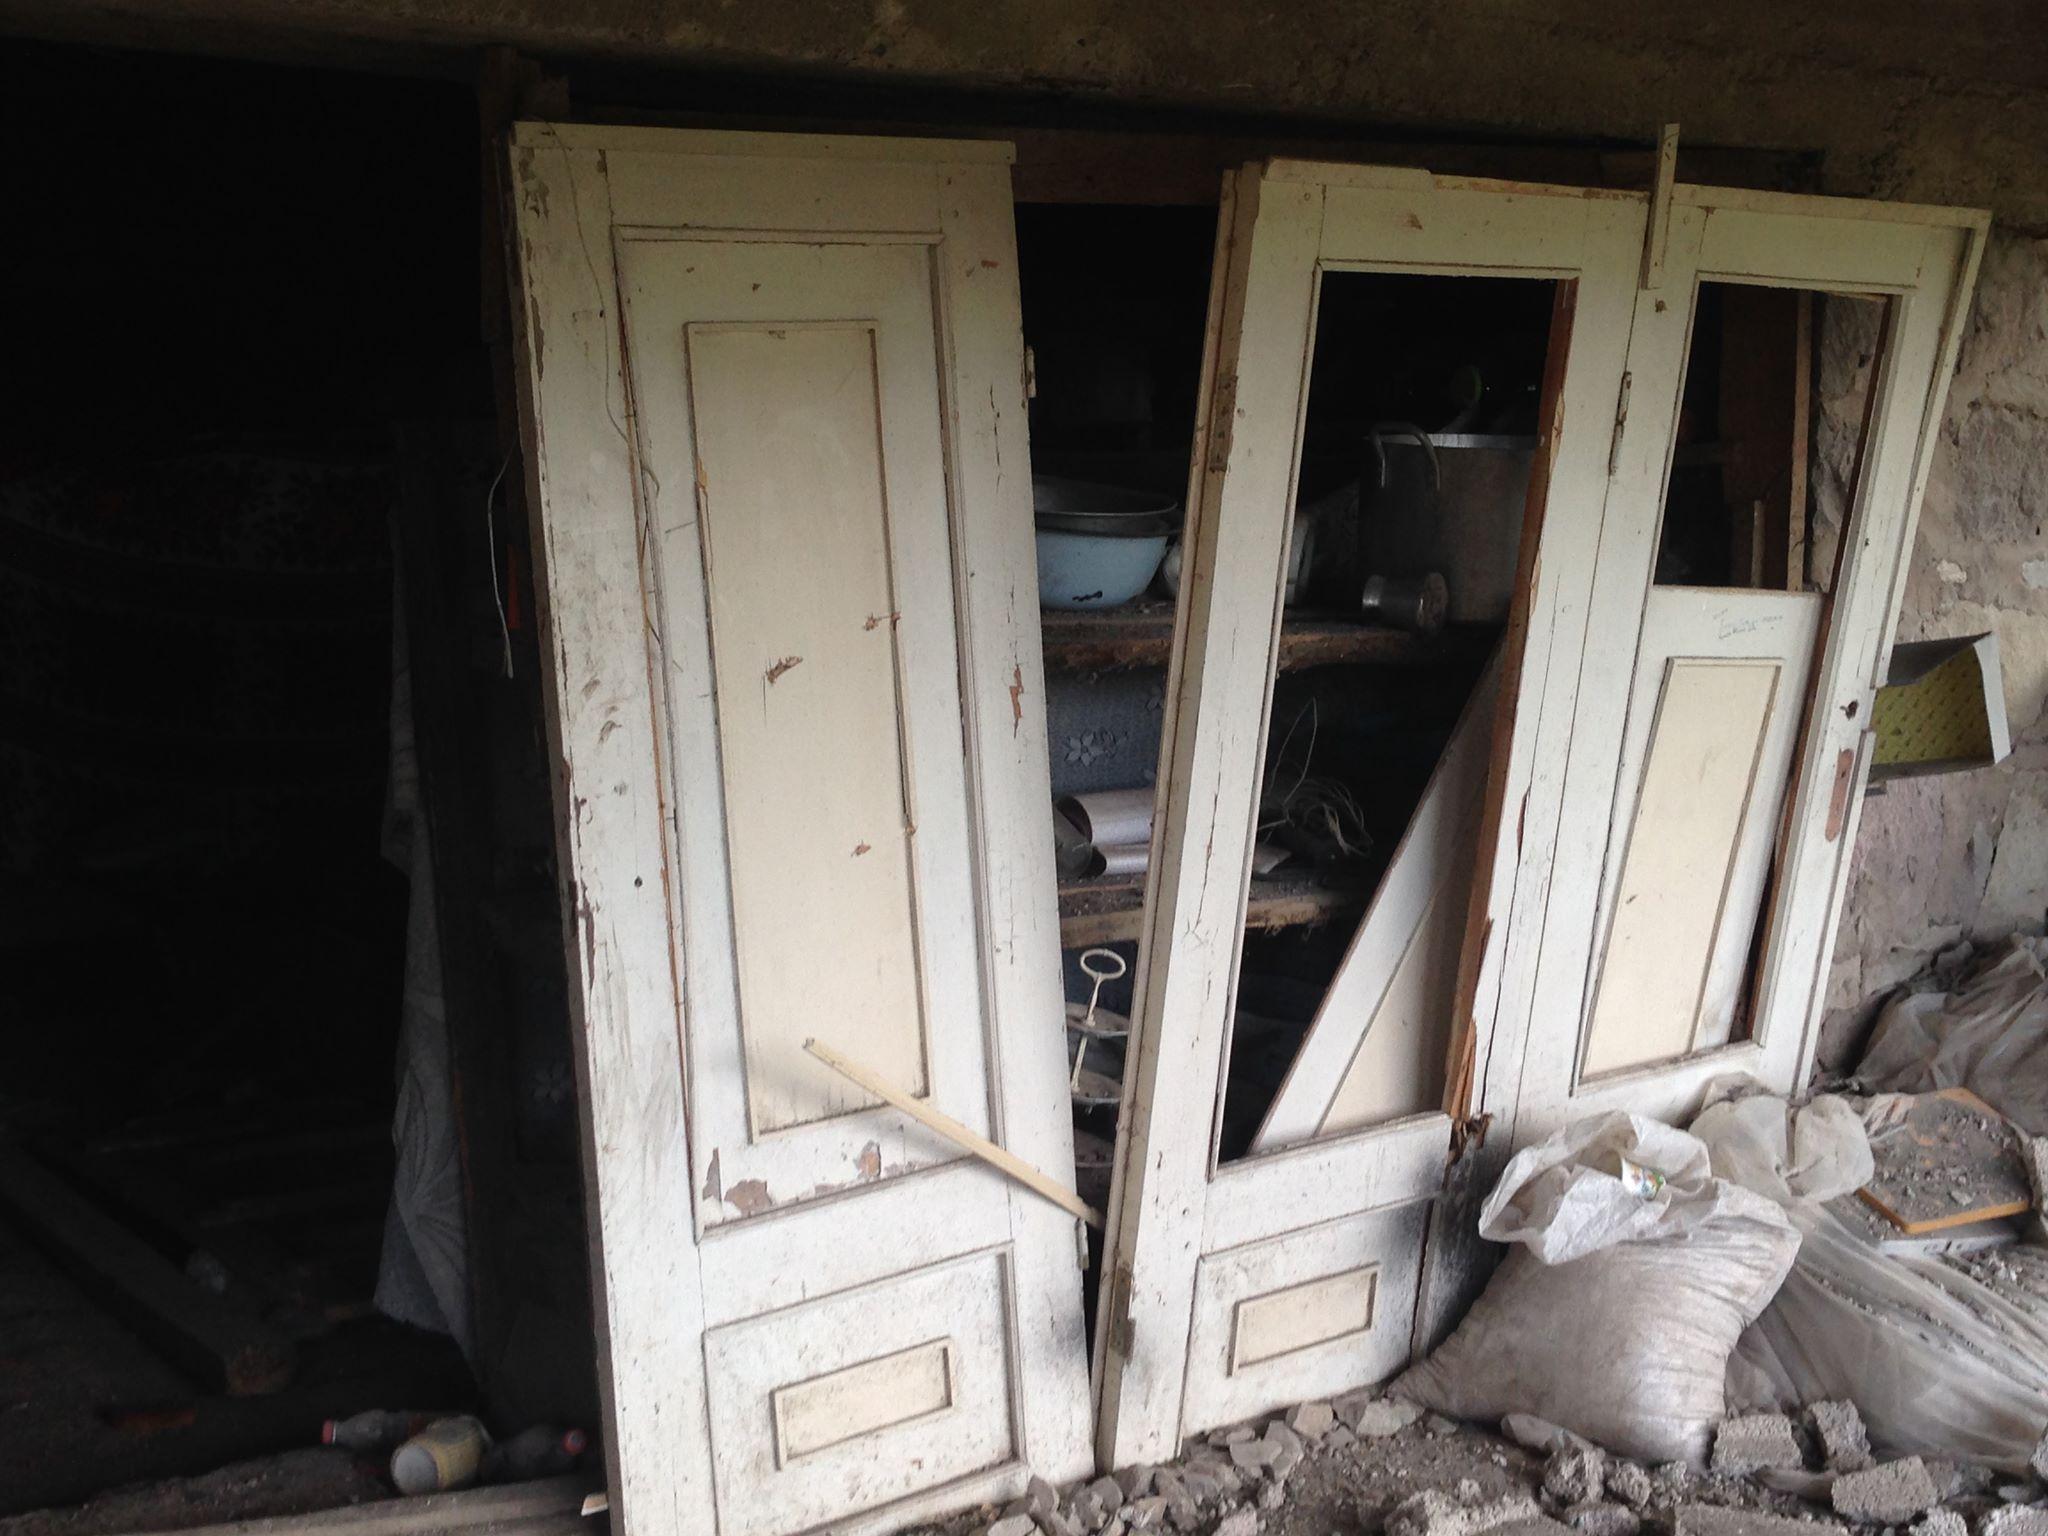 Many houses in the Tavush region were badly damaged. Photo: Armine Avetisyan / OC Media.